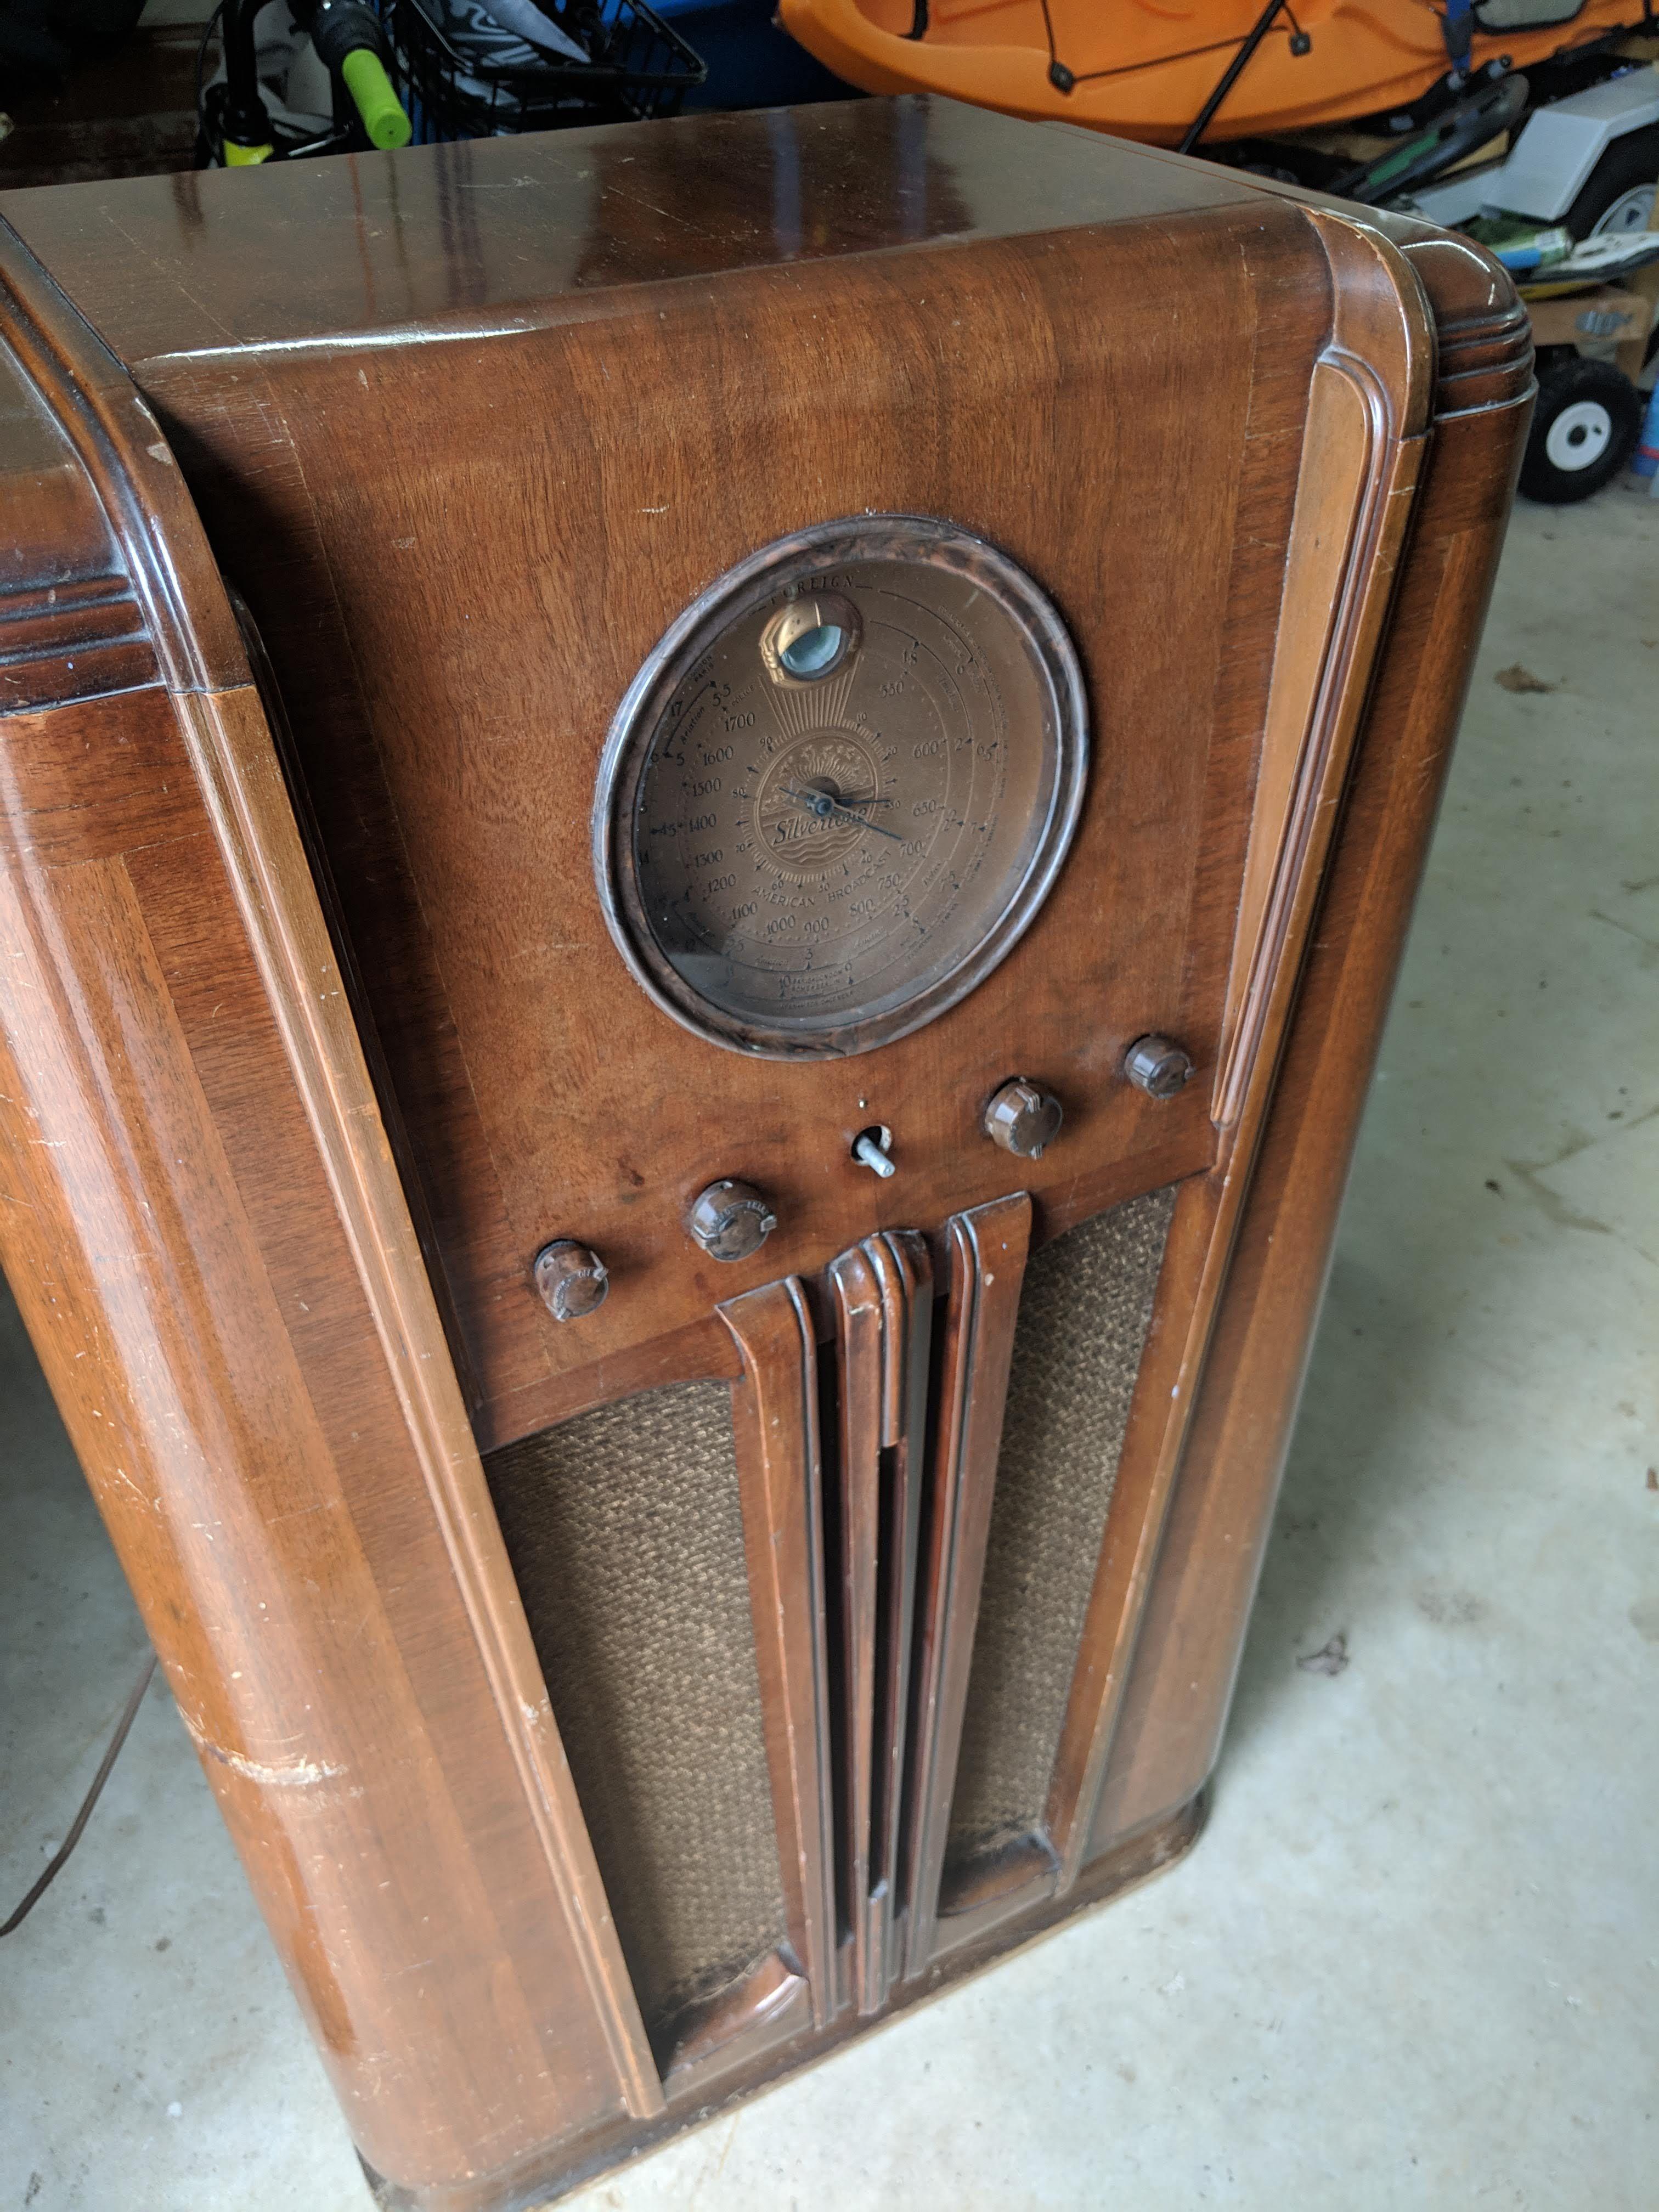 I restored an 83 year old radio handmade crafts howto